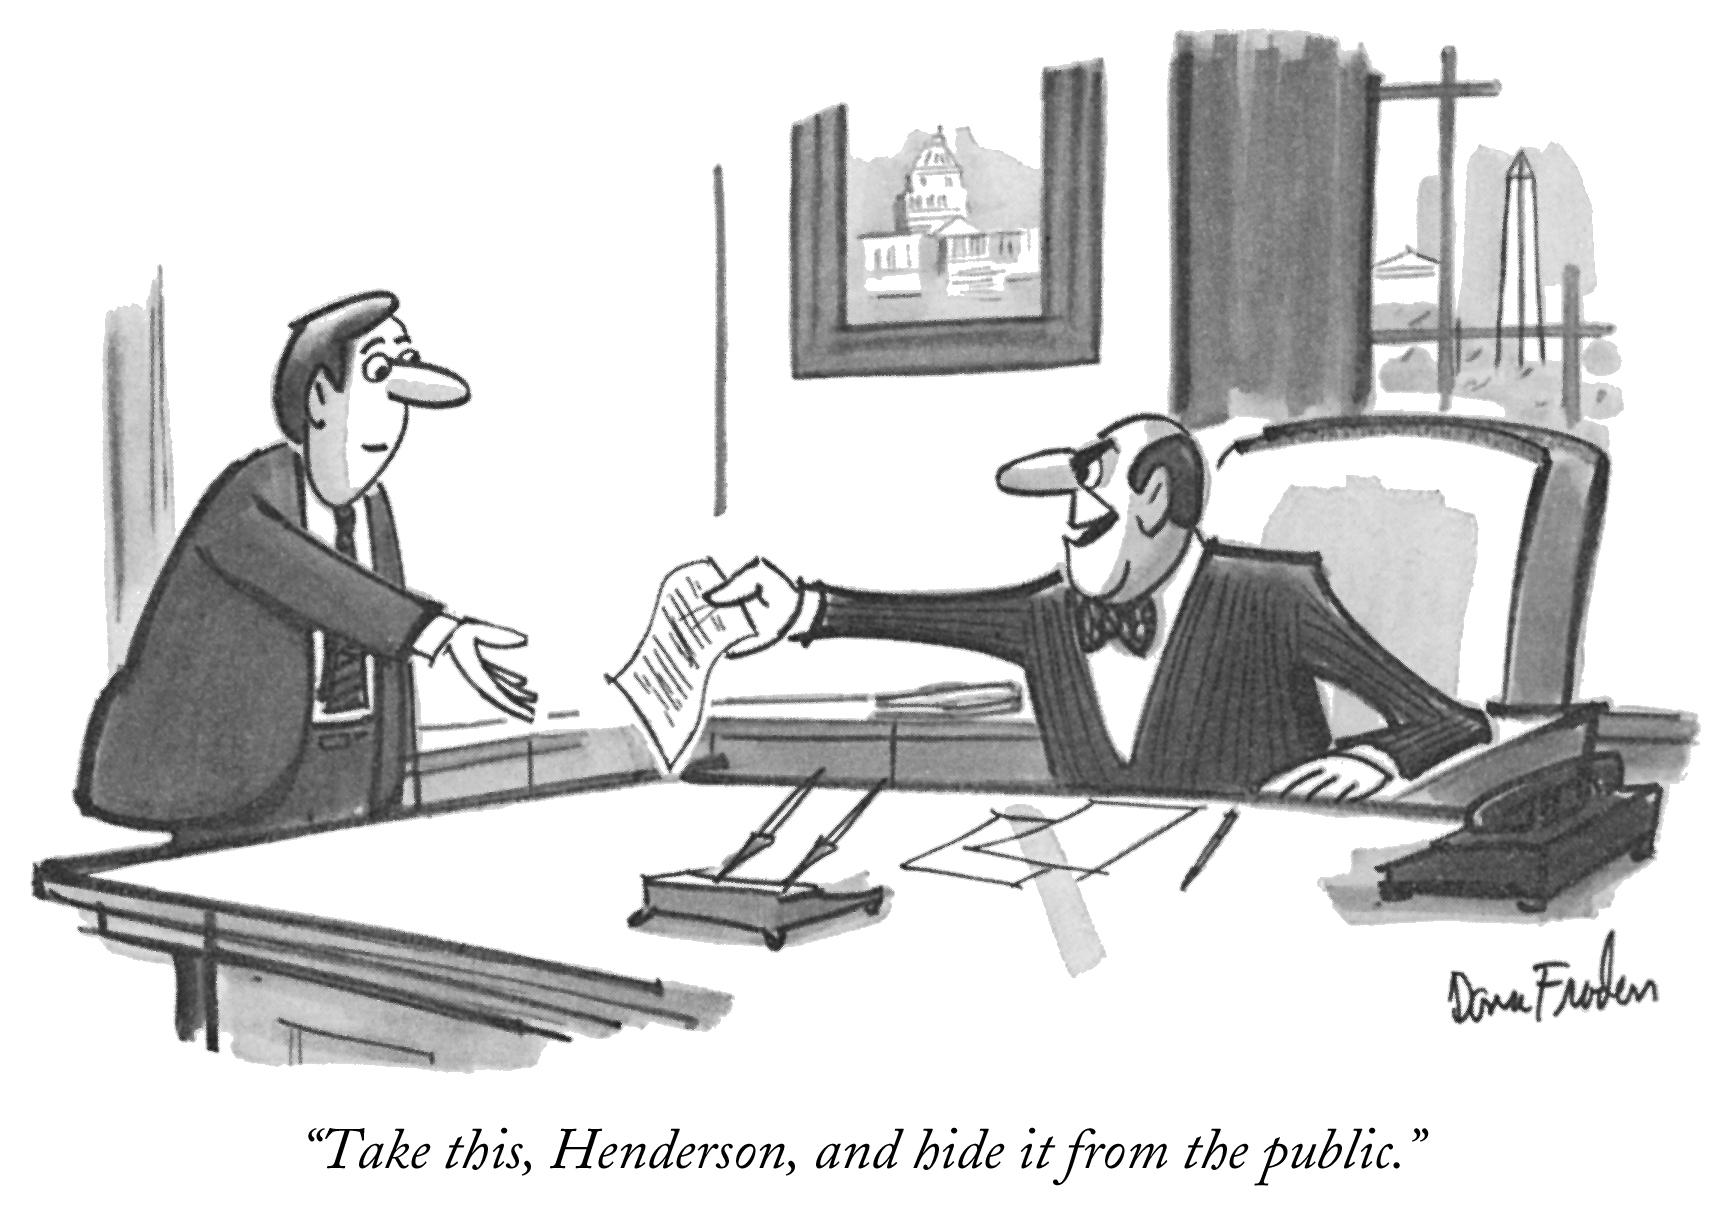 Dana Fradon Prolific New Yorker Cartoonist With A Satirical Edge